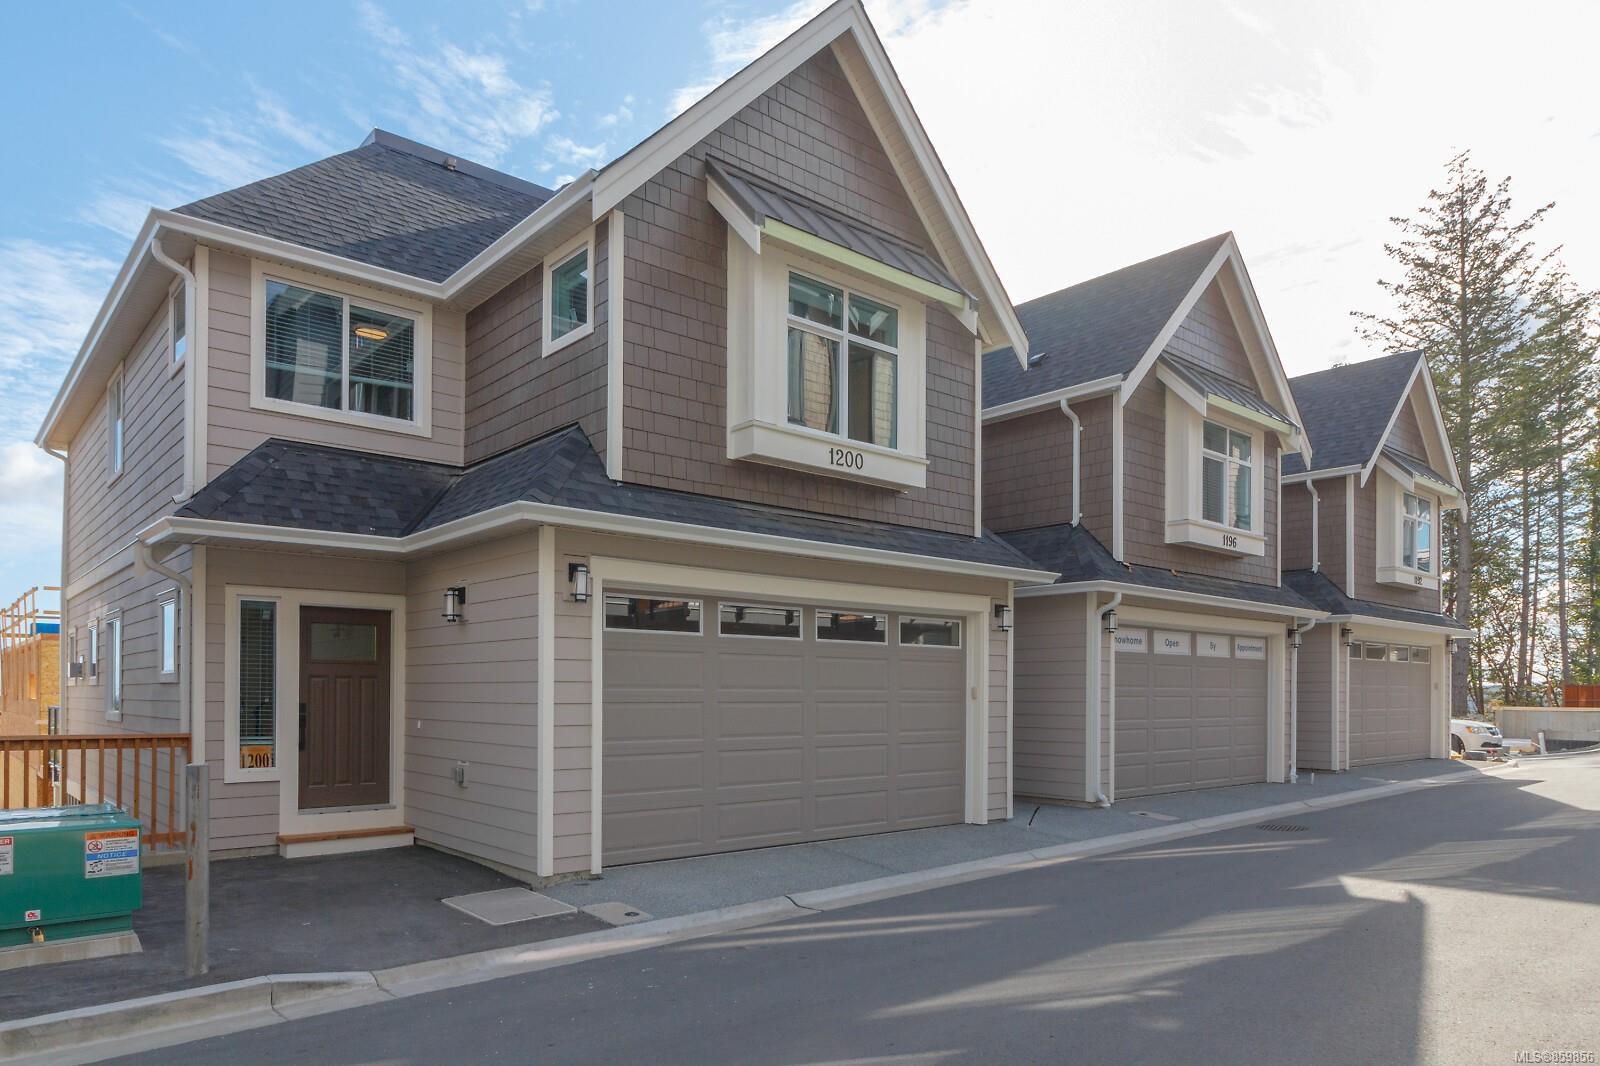 Main Photo: 1216 Moonstone Loop in : La Bear Mountain Row/Townhouse for sale (Langford)  : MLS®# 859856